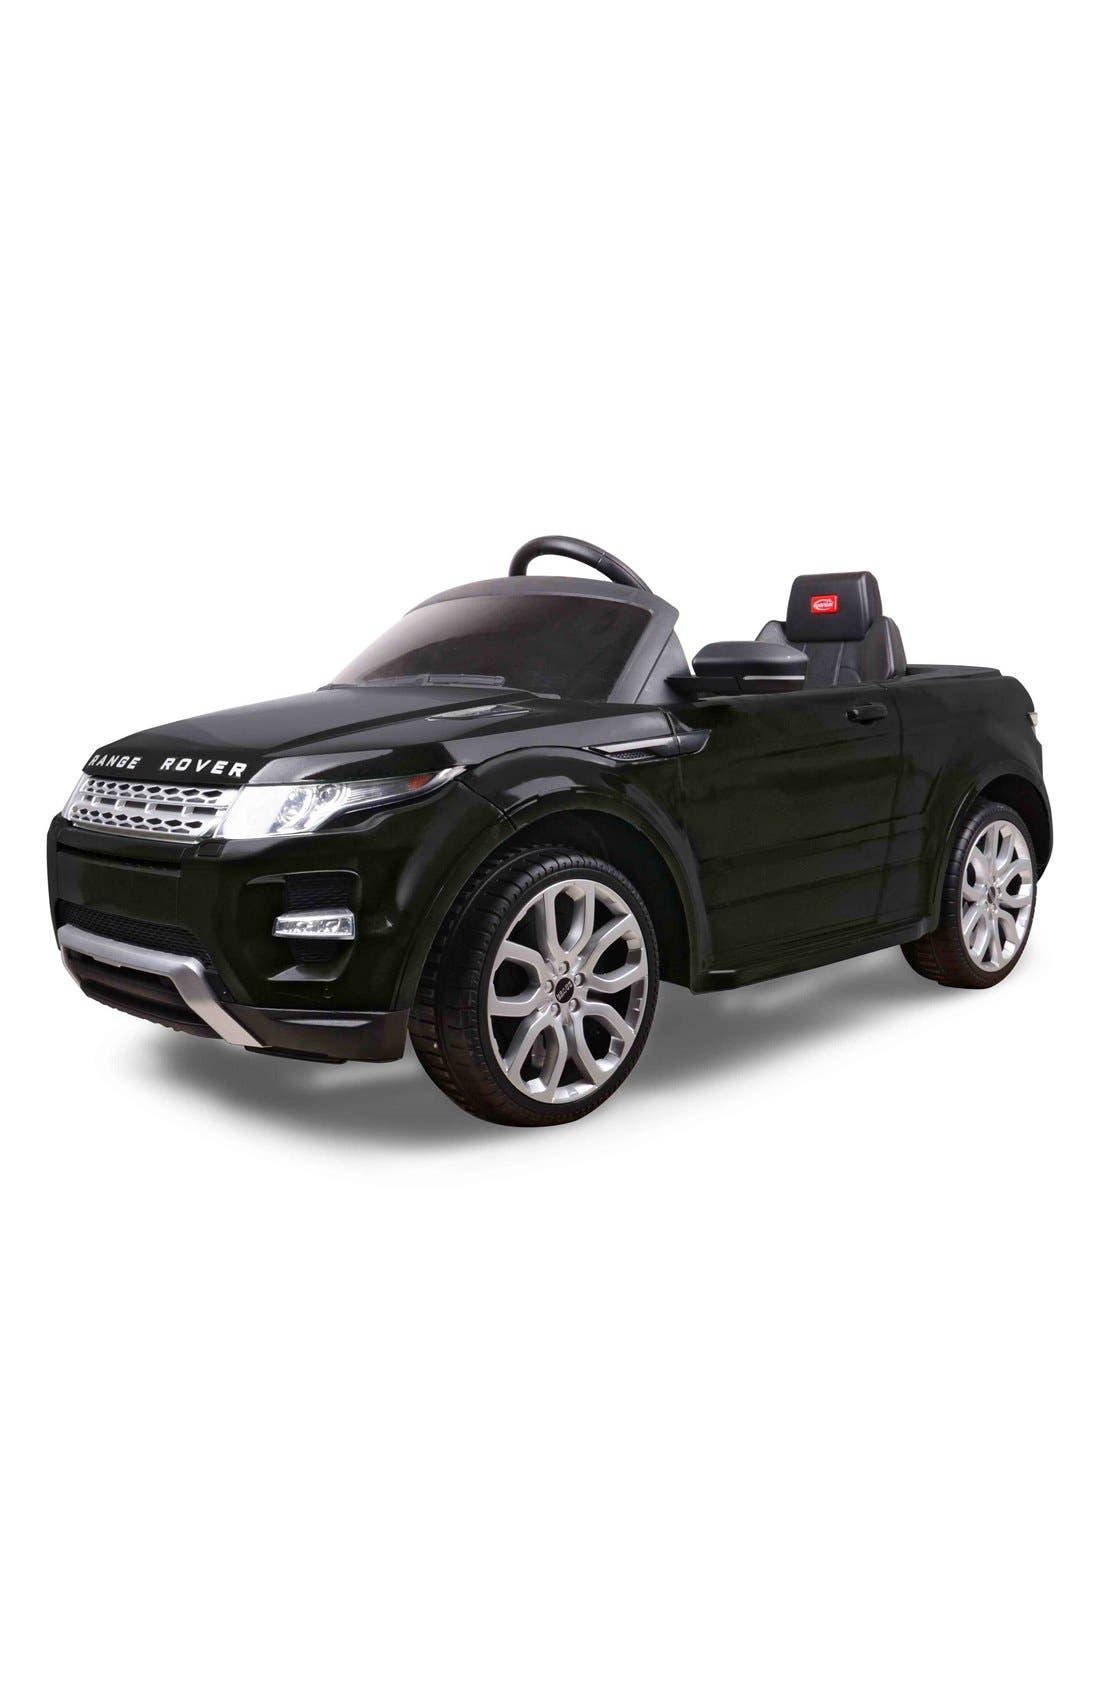 'Range Rover Evoque' 12V RC Ride-On Toy Car,                             Alternate thumbnail 4, color,                             001